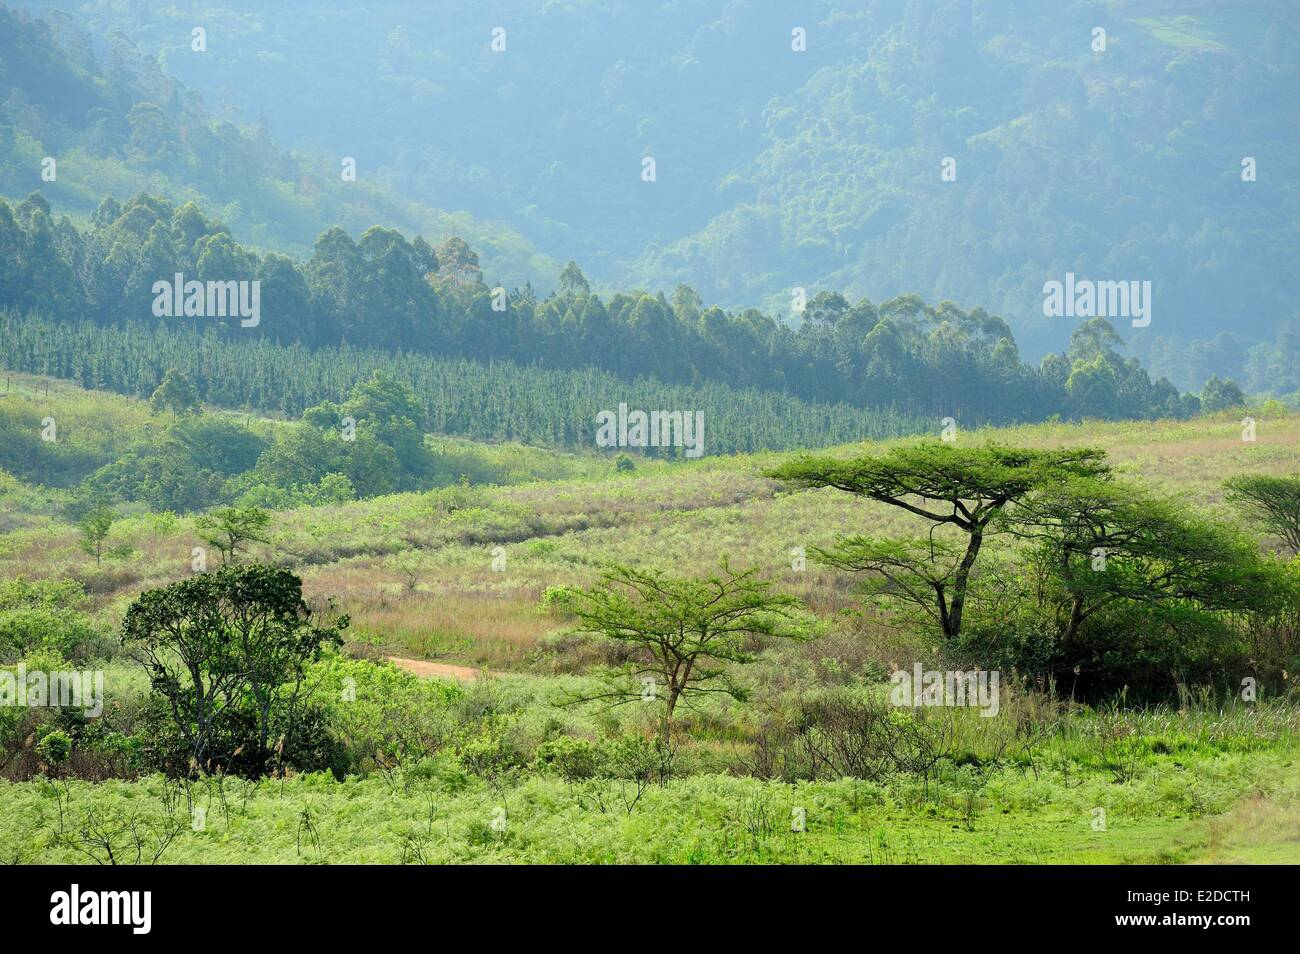 Swaziland Hhohho district Ezulwini valley (valley of Heaven) Mlilwane Wildlife Sanctuary - Stock Image